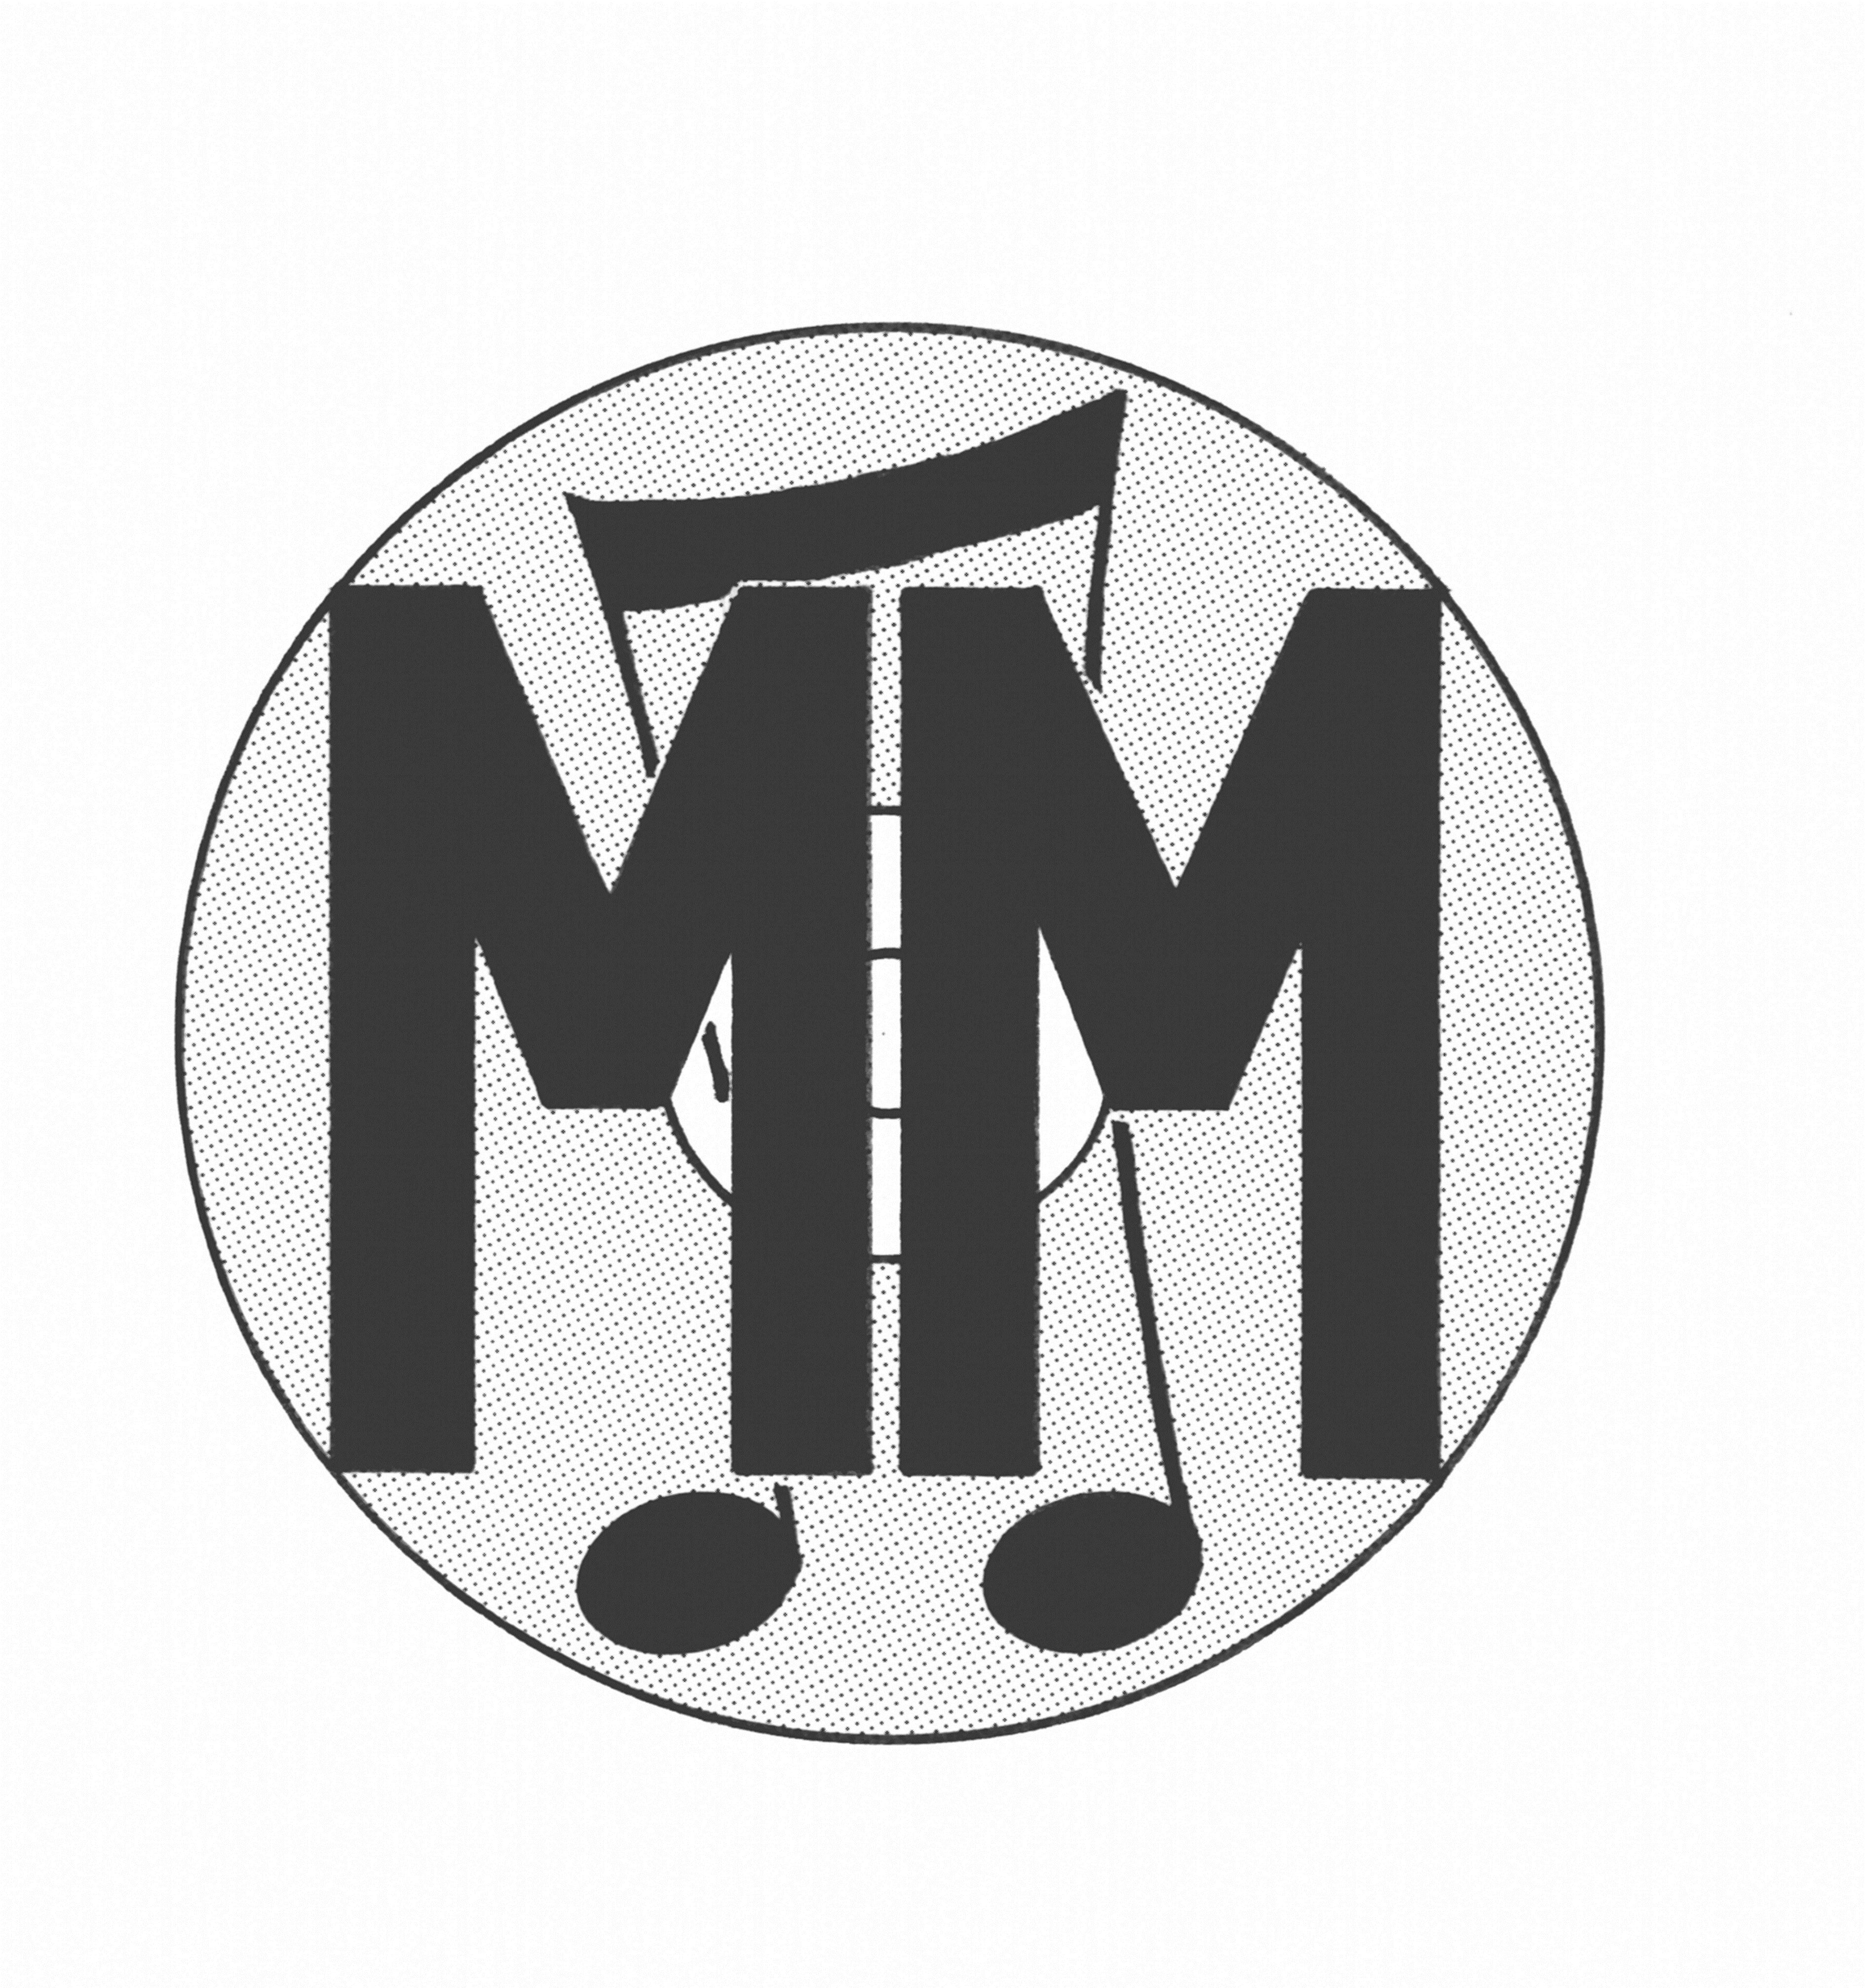 M M Logo Clipart #1-M M Logo Clipart #1-12